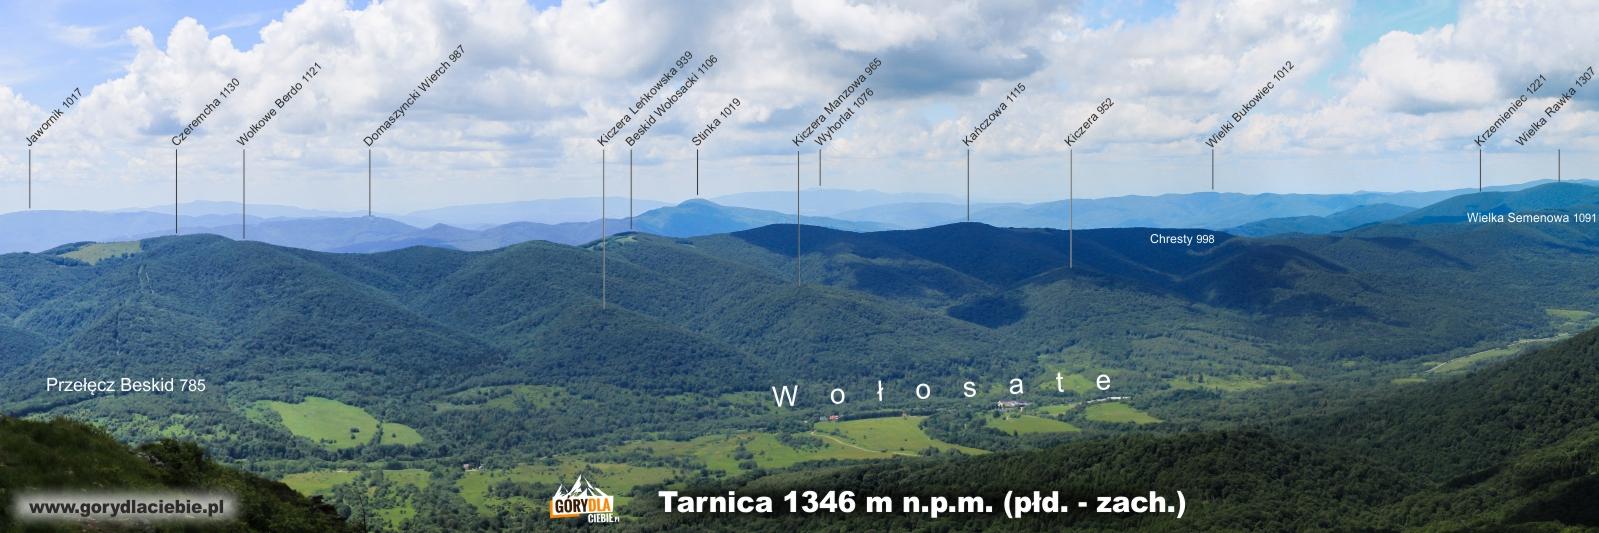 Panorama z Tarnicy na płd.-zach. (opis)